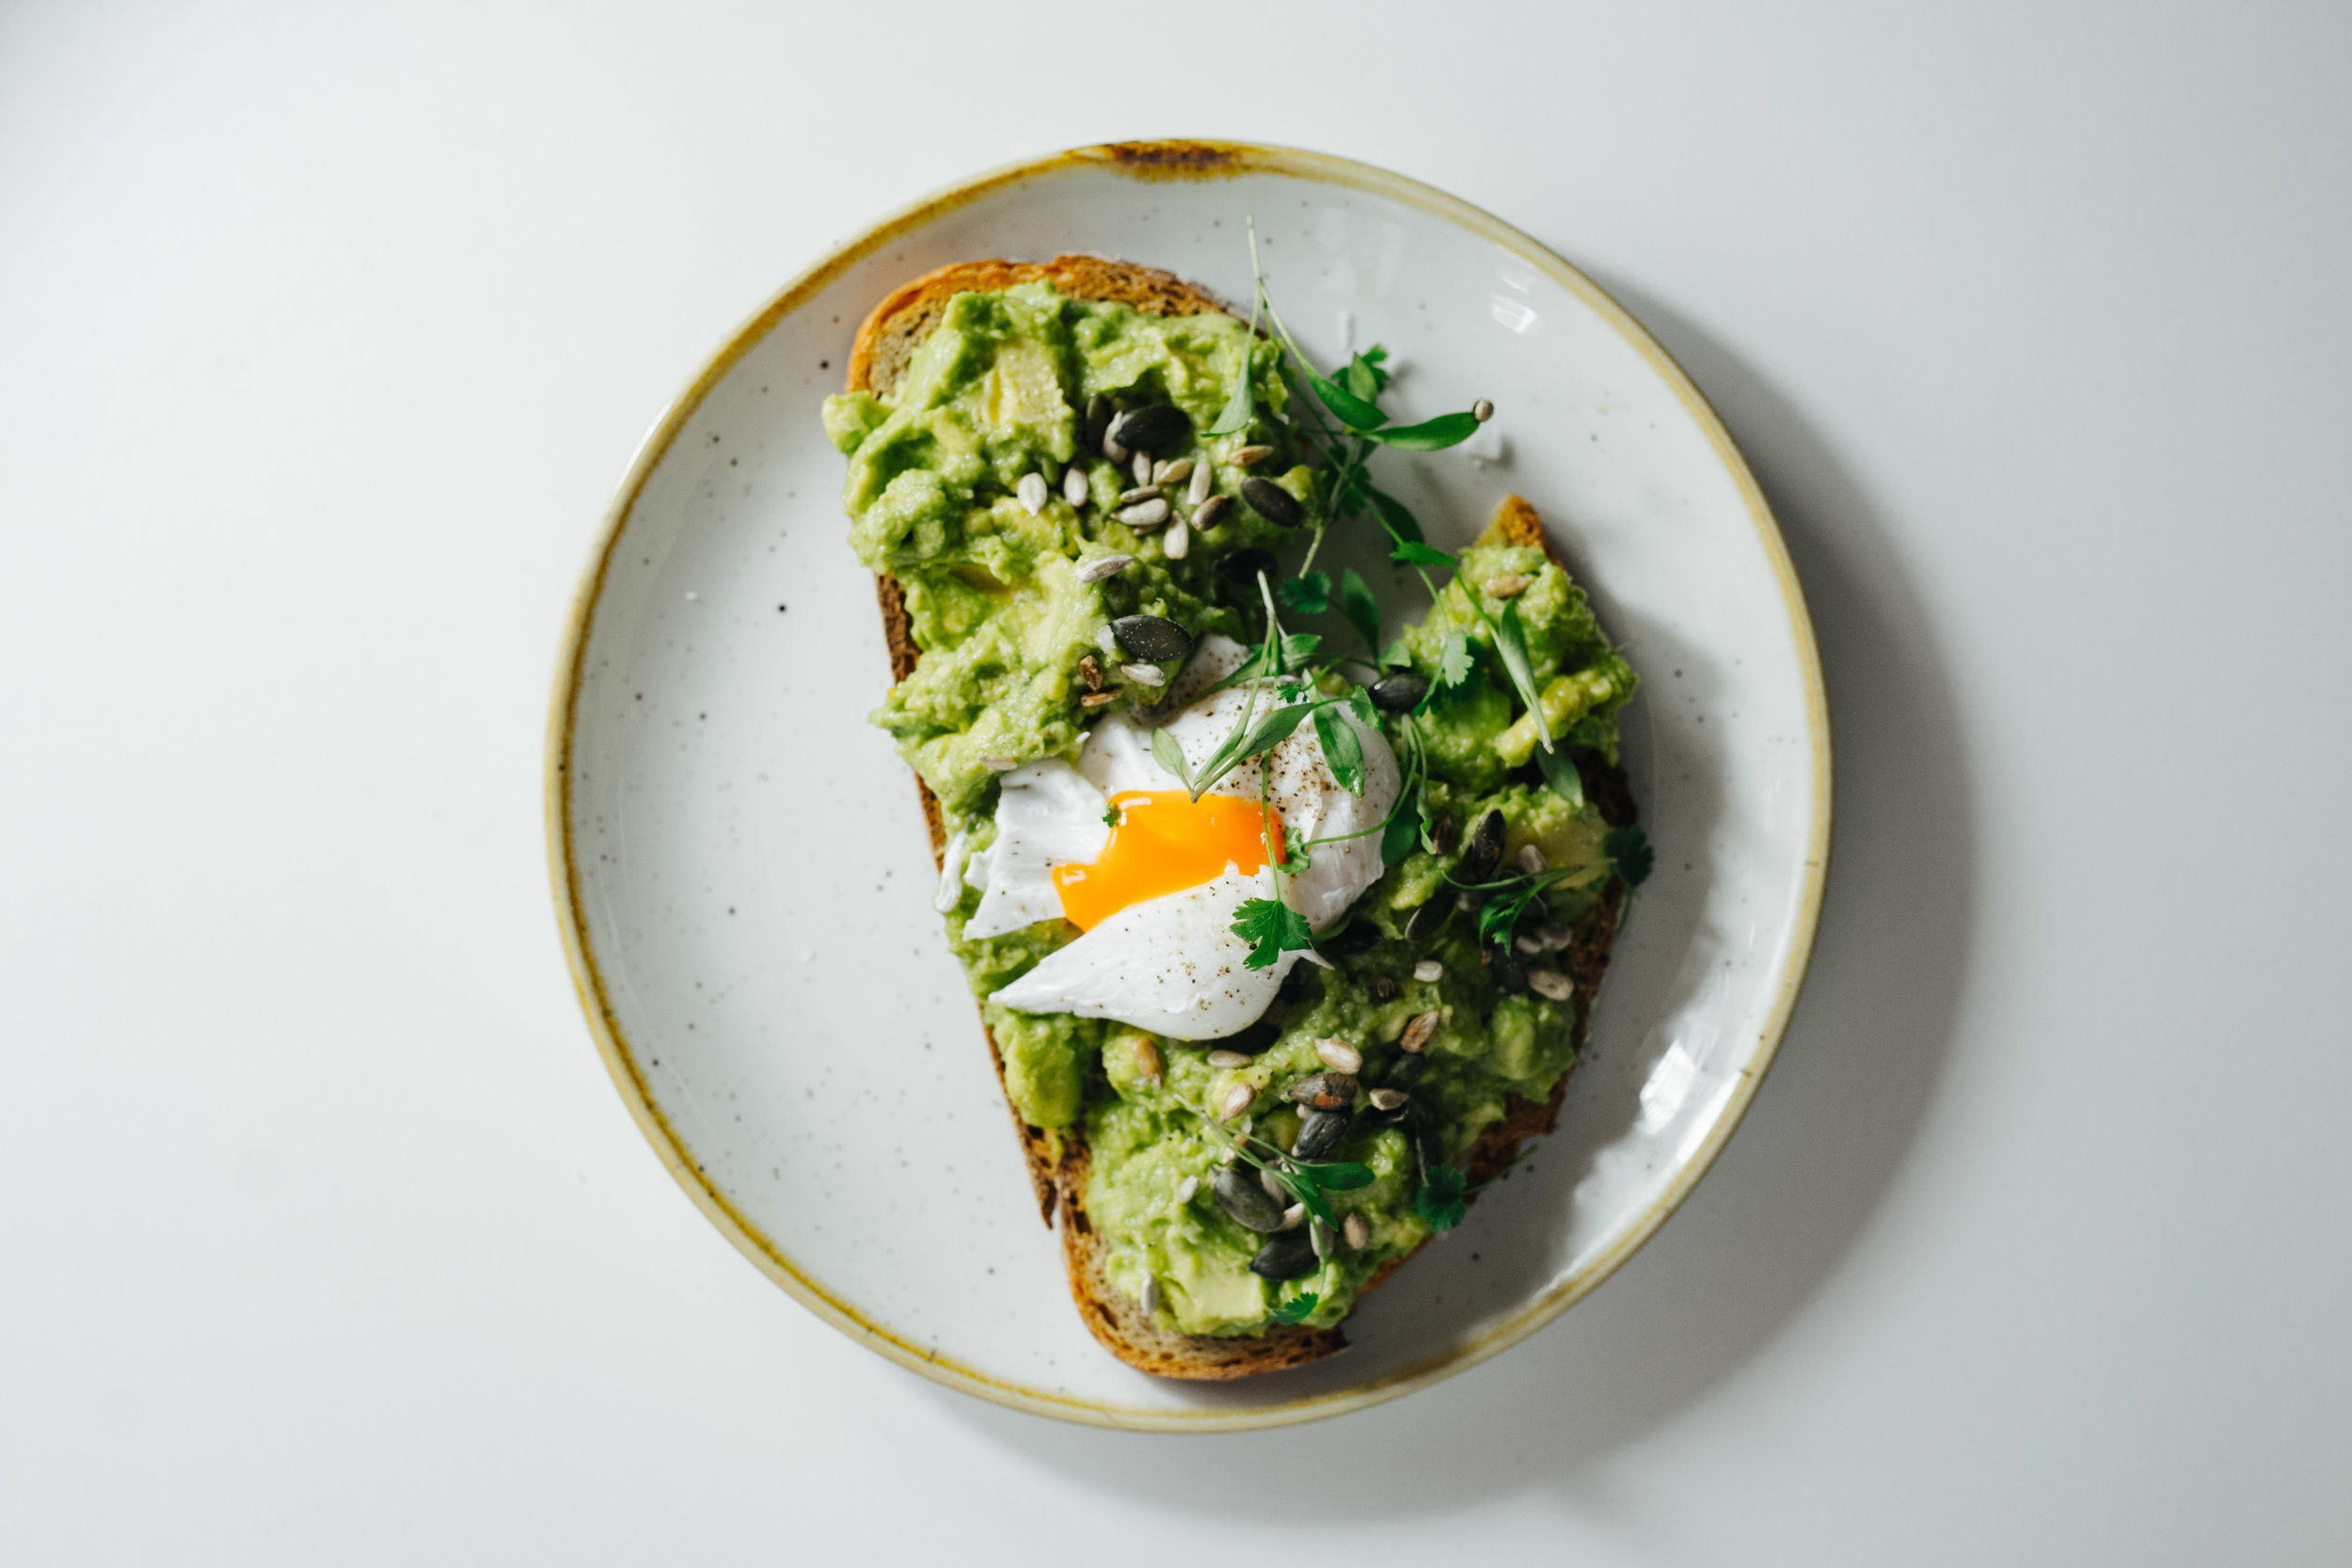 Avocado Toast With Egg.jpg